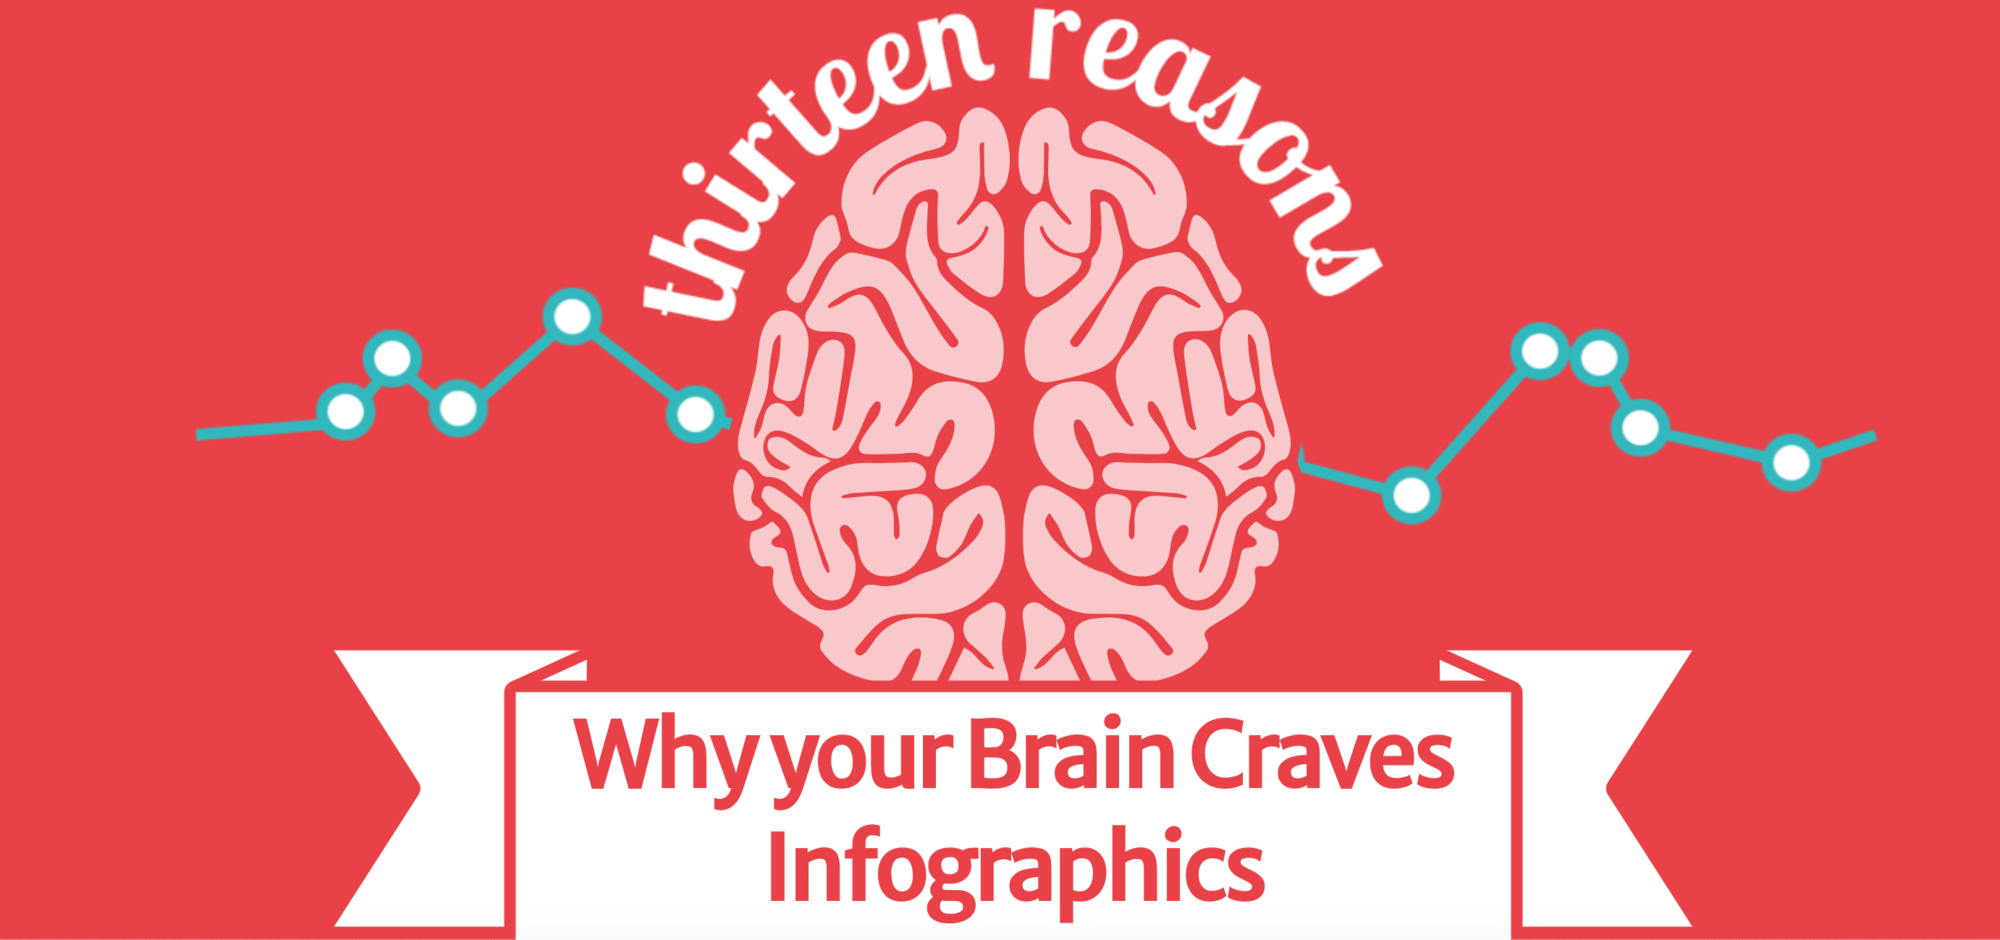 Interaktive Infografik